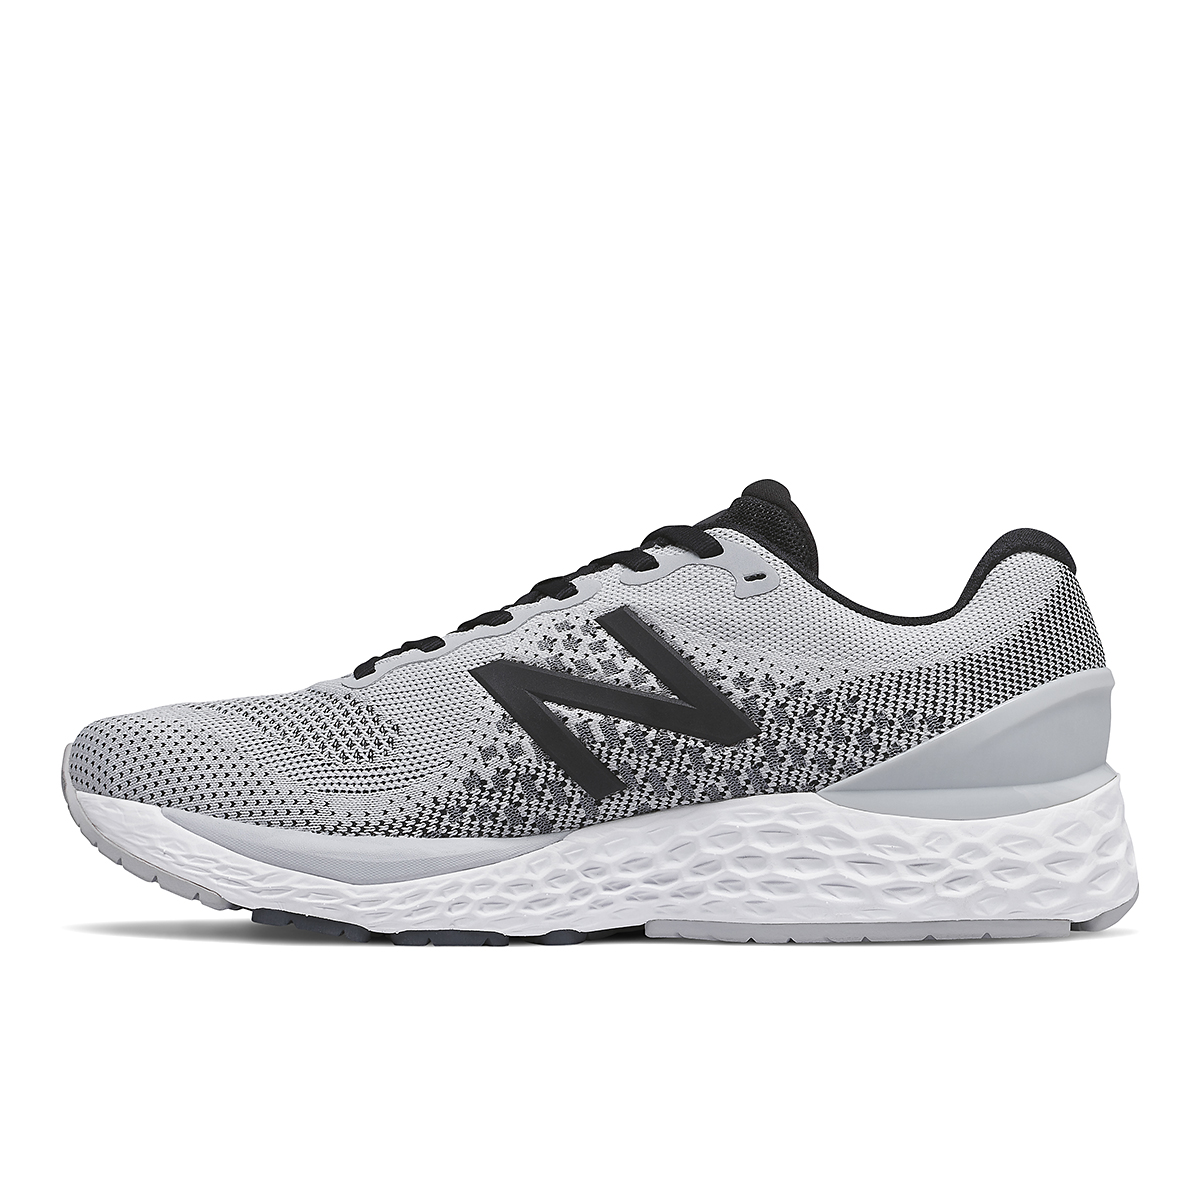 Men's New Balance 880V10 Running Shoe - Color: Light Aluminum - Size: 7 - Width: Wide, Light Aluminum, large, image 2